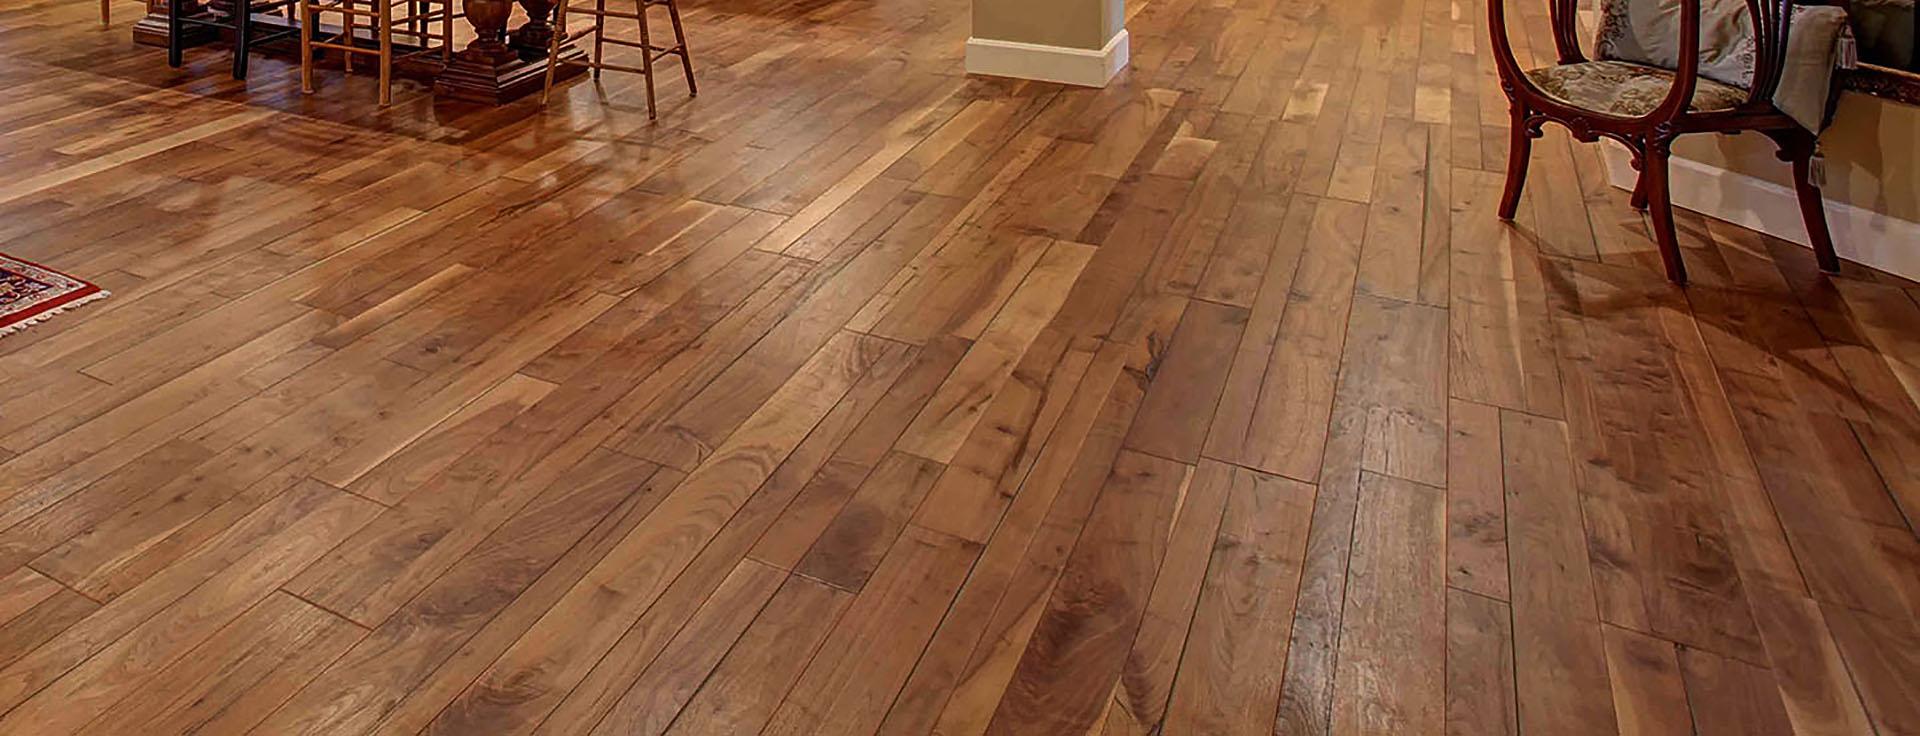 flooring_proven_history